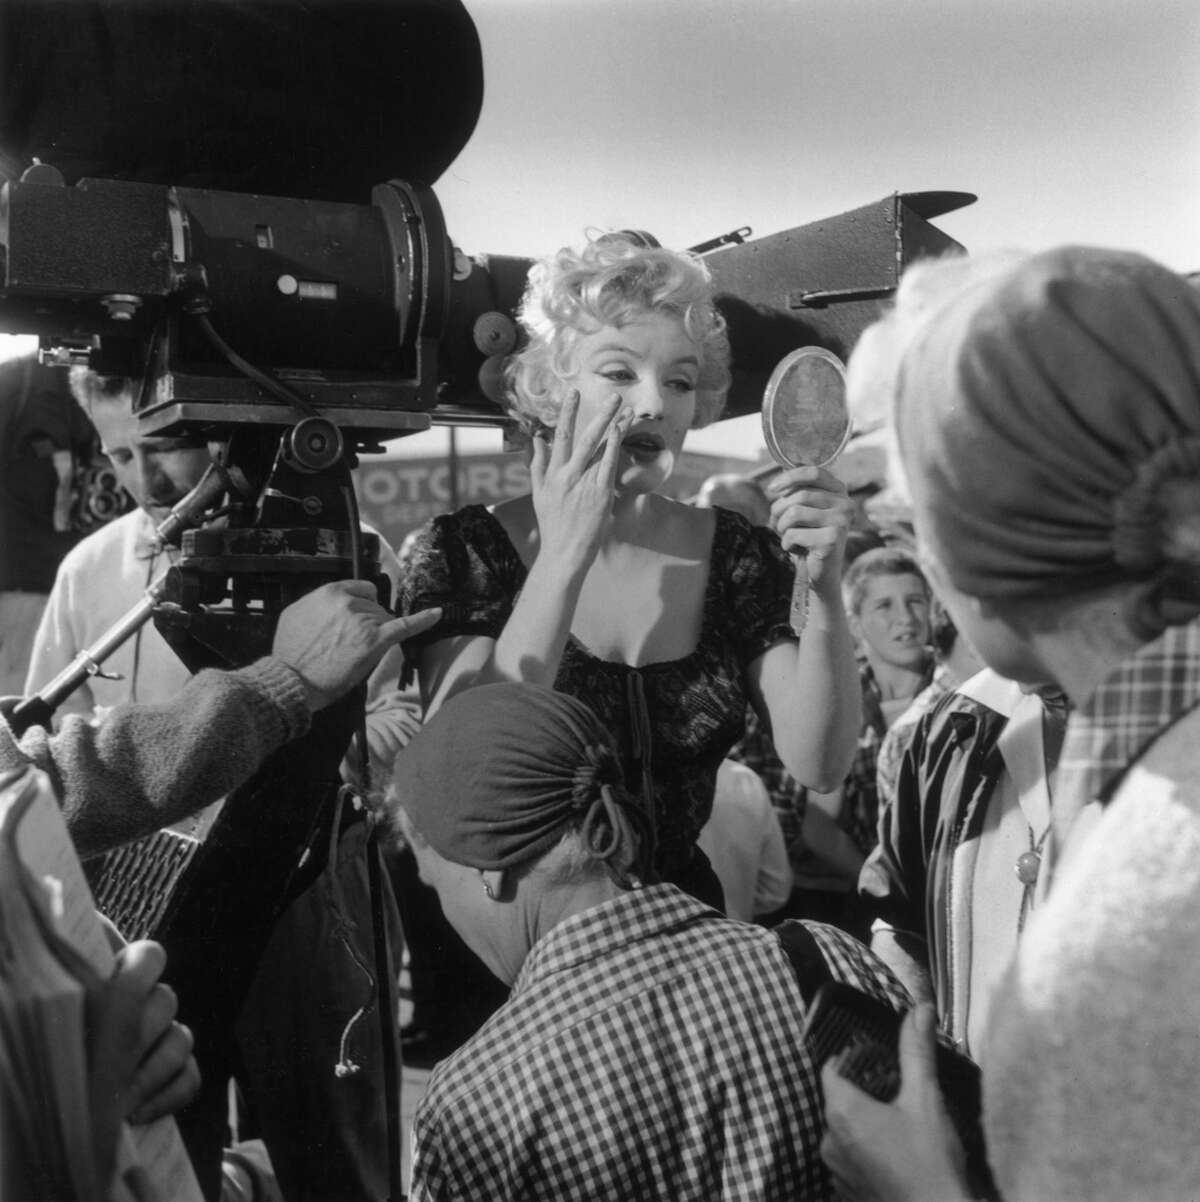 Marilyn Monroe adjusts her make-up, using a handheld mirror on the set of director Joshua Logan's film,